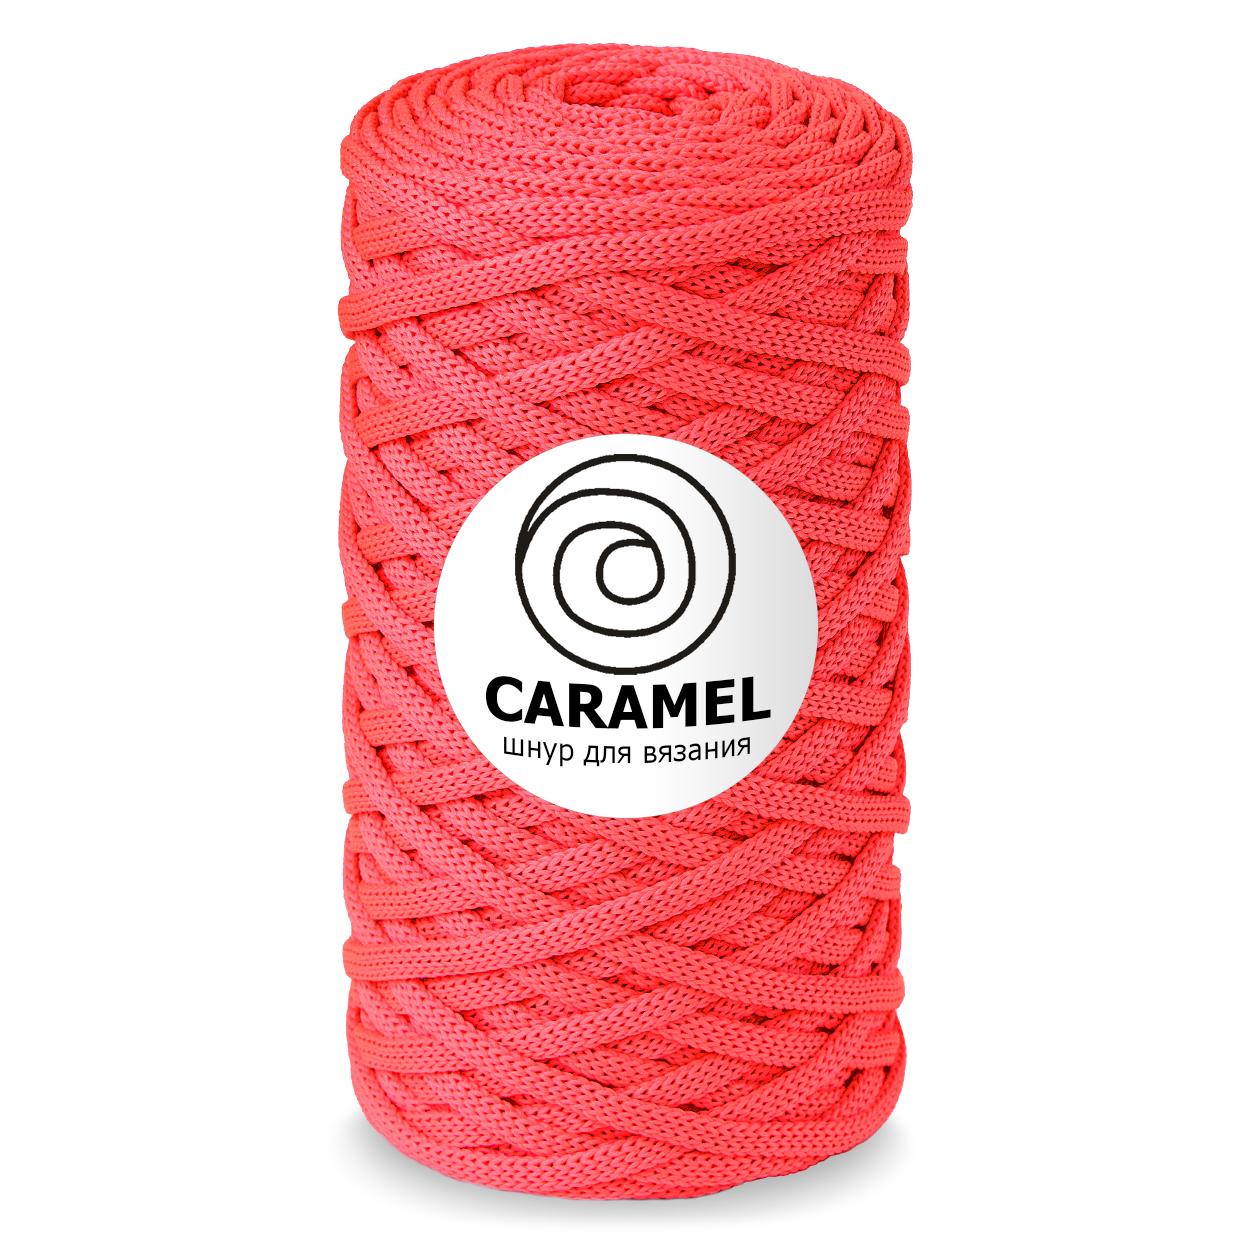 Caramel Коралл